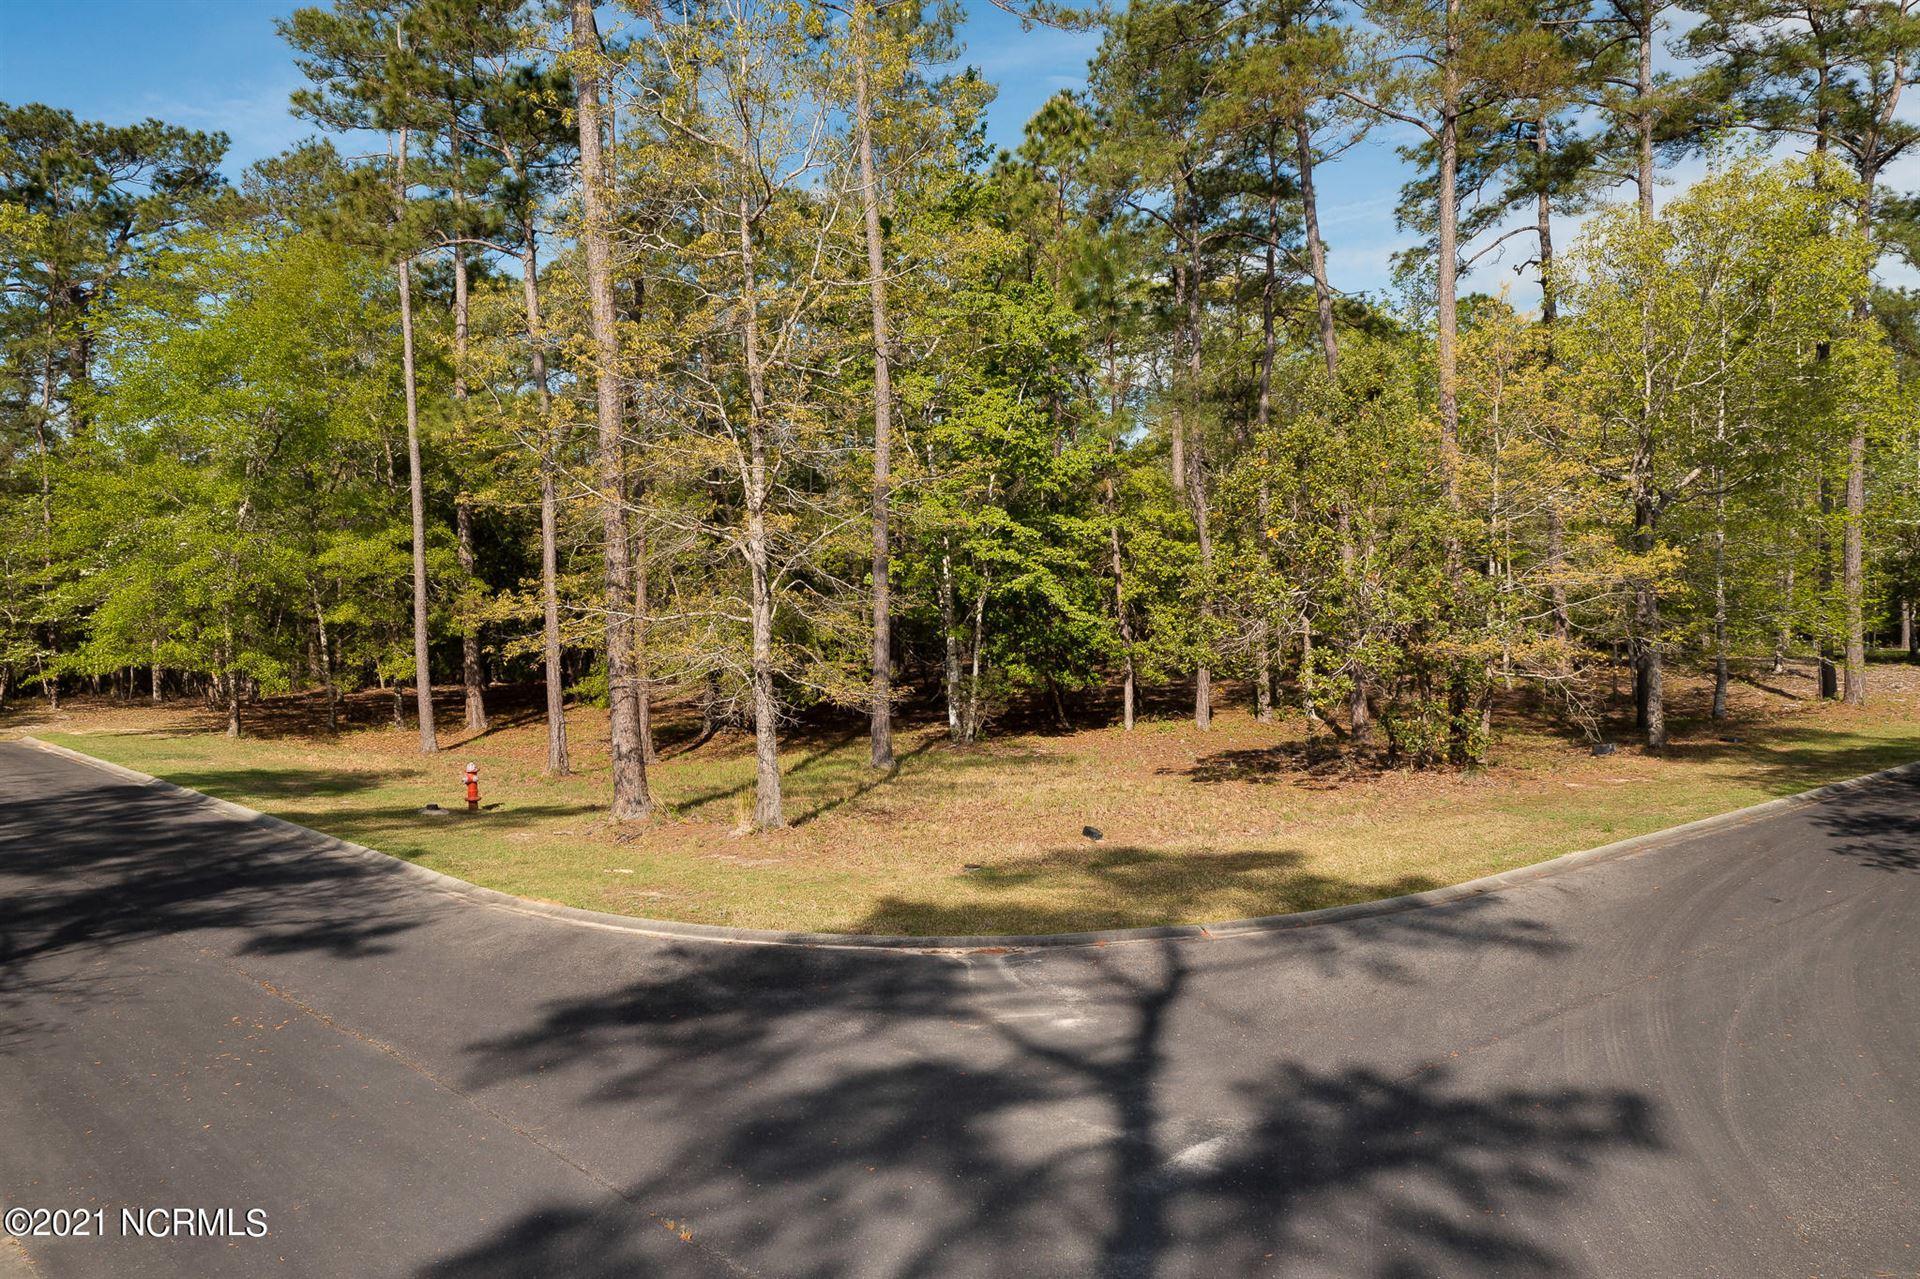 Photo of L-44 Pine Brook Trail, Shallotte, NC 28470 (MLS # 100267484)